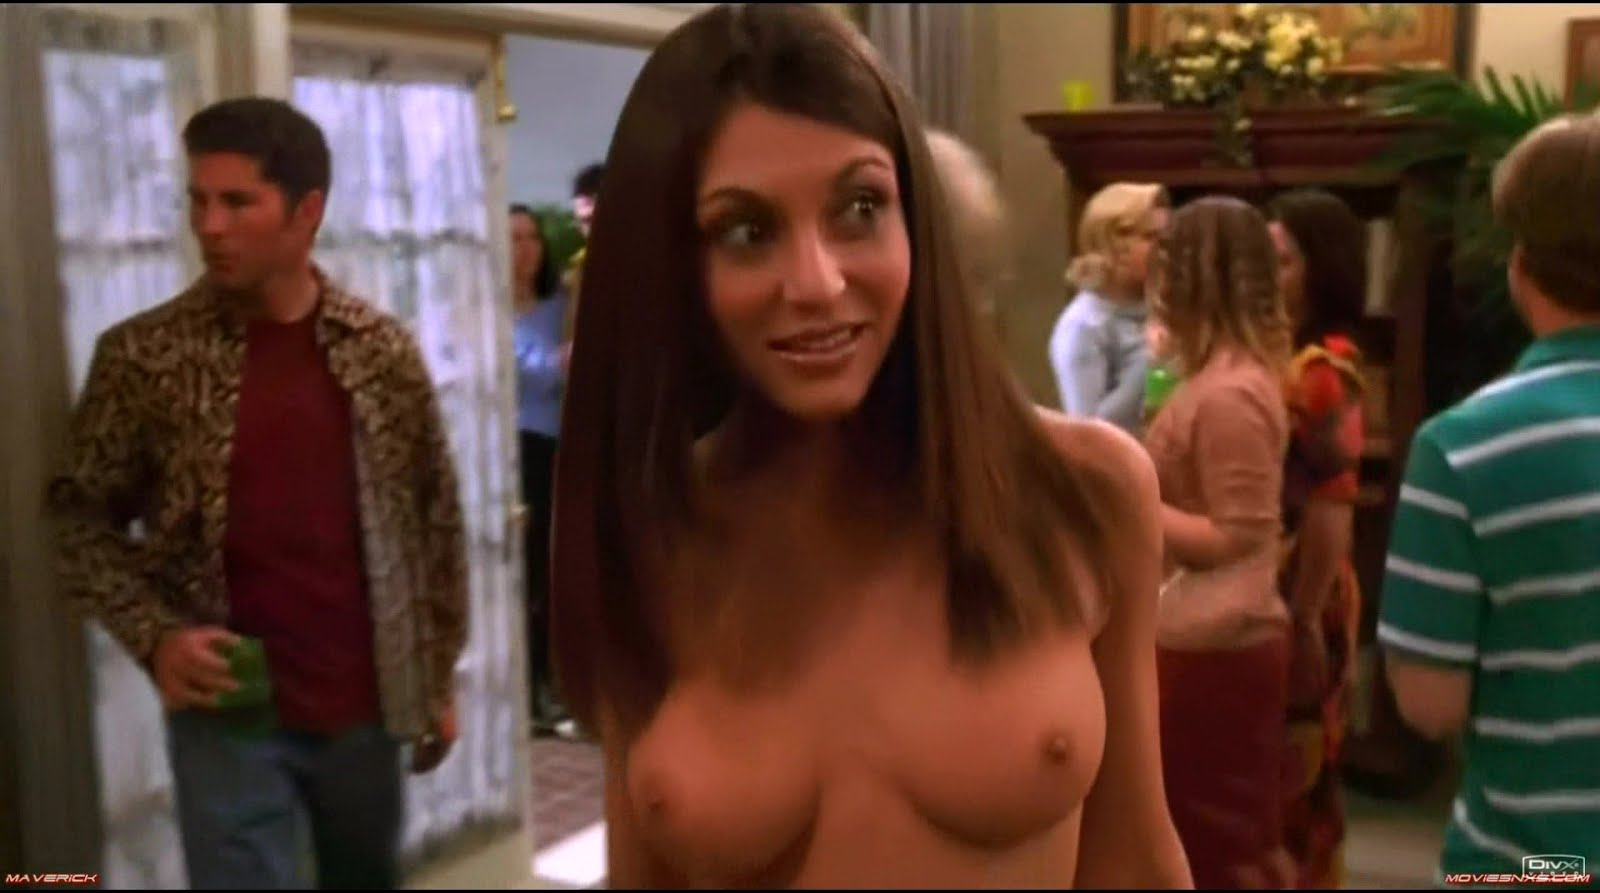 Nude homemade black sex videos